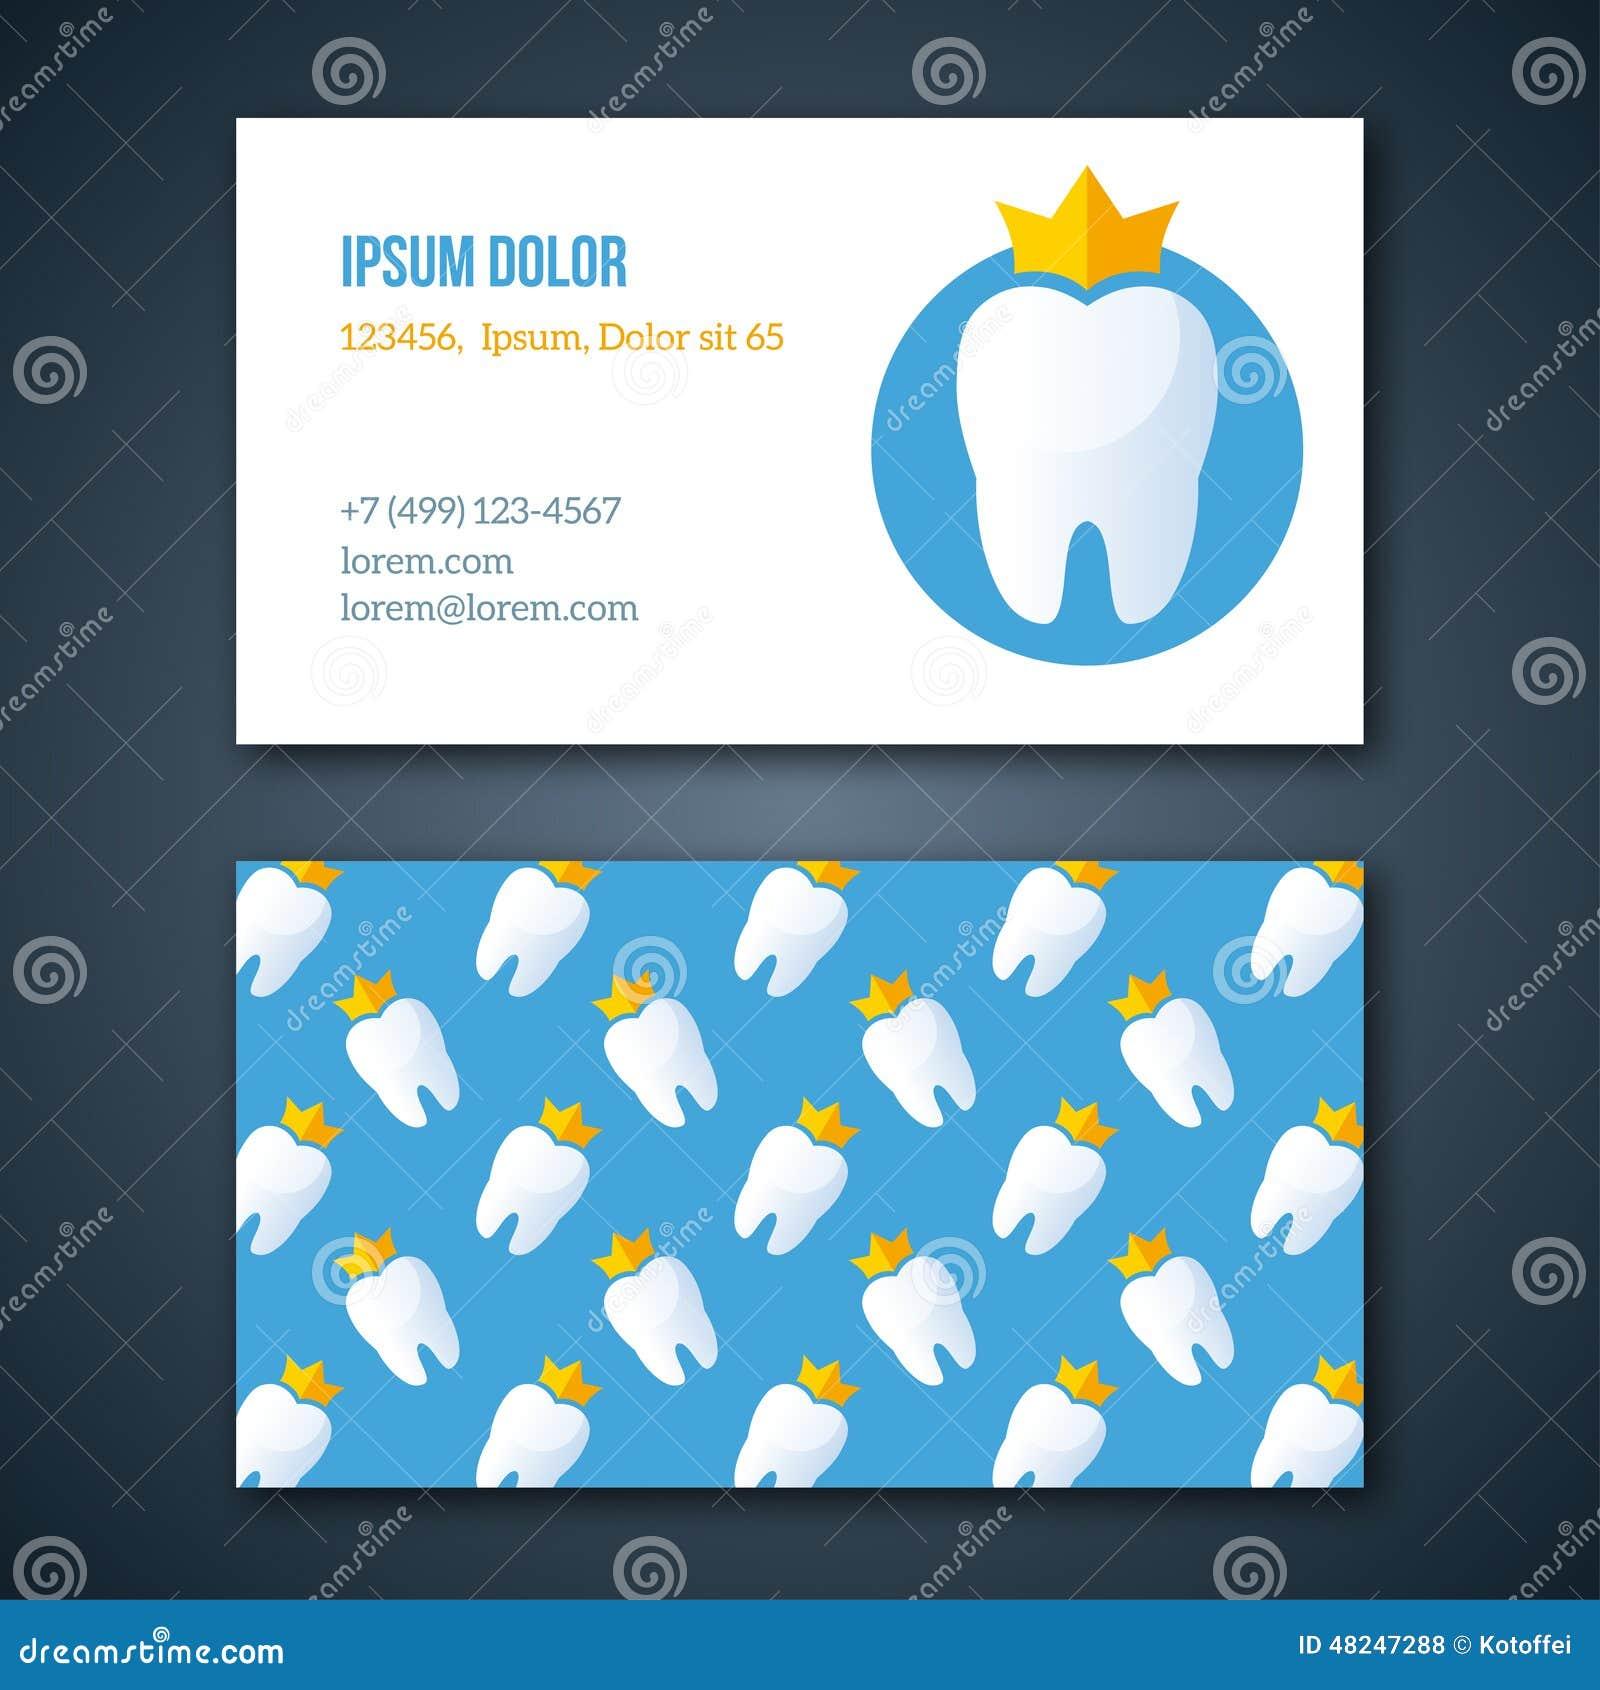 Dental Clinic Corporate Identity Template. Stock Vector ...